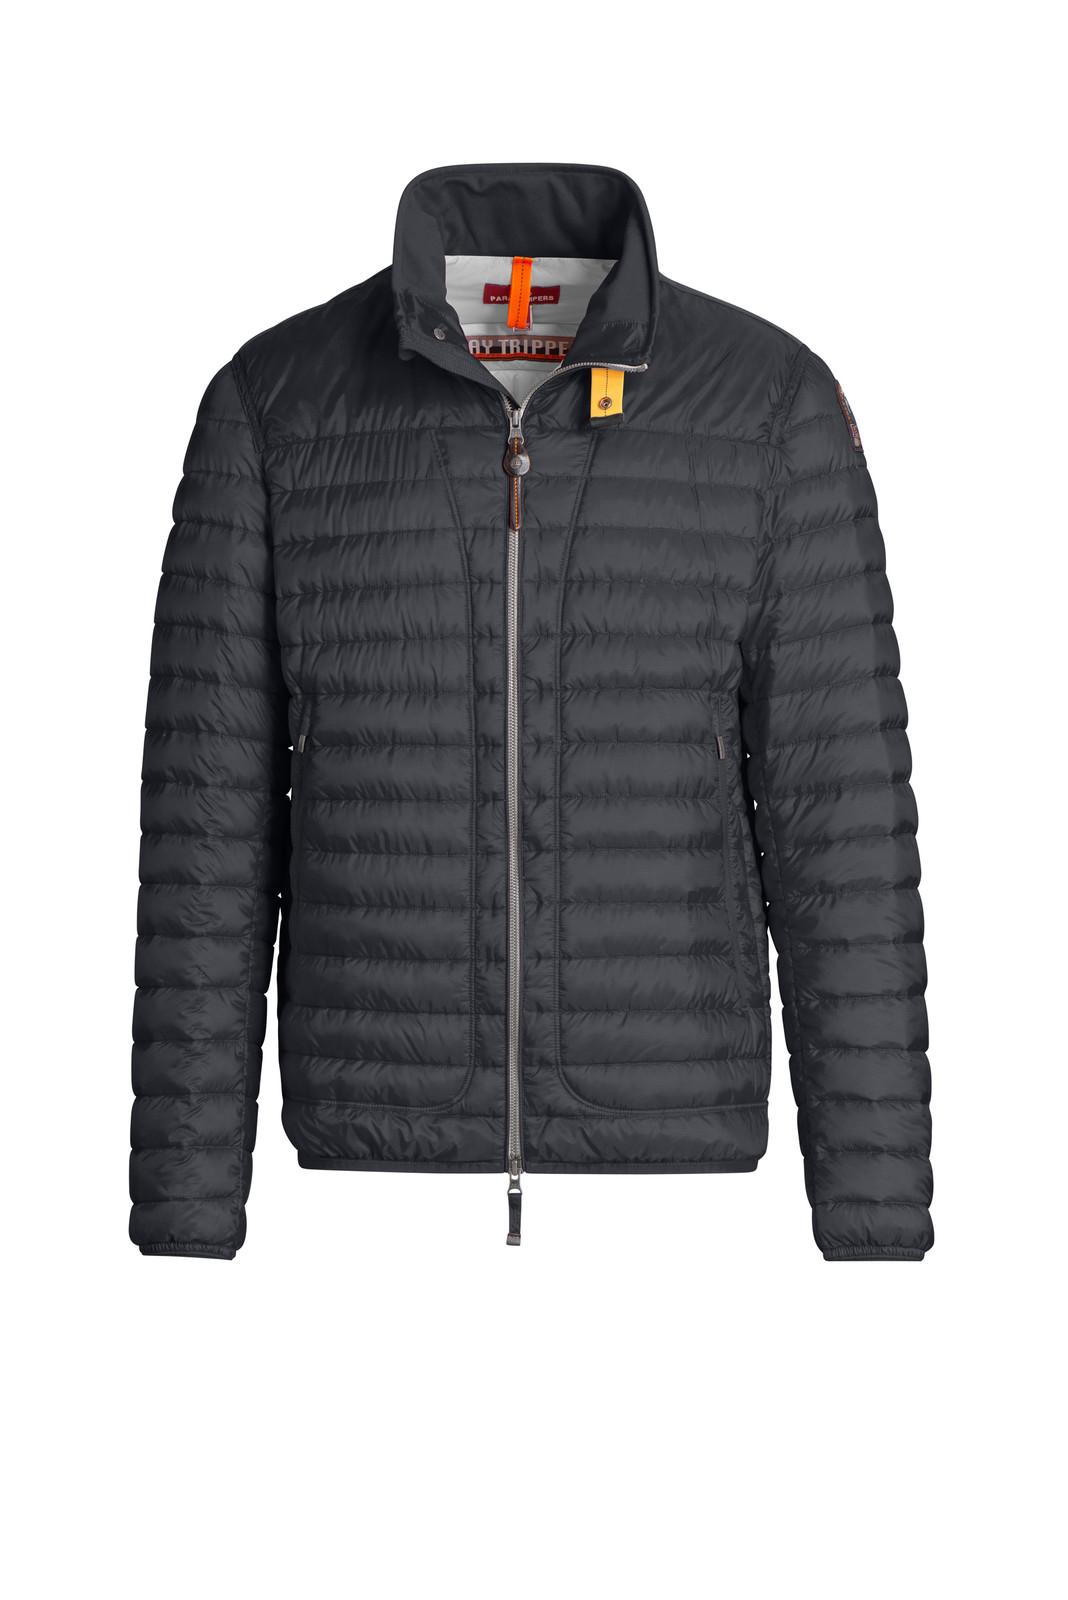 Parajumpers Arthur Daytripper Puffer Jacket, Mens - Nine Iron (PMJCKDT02-765)